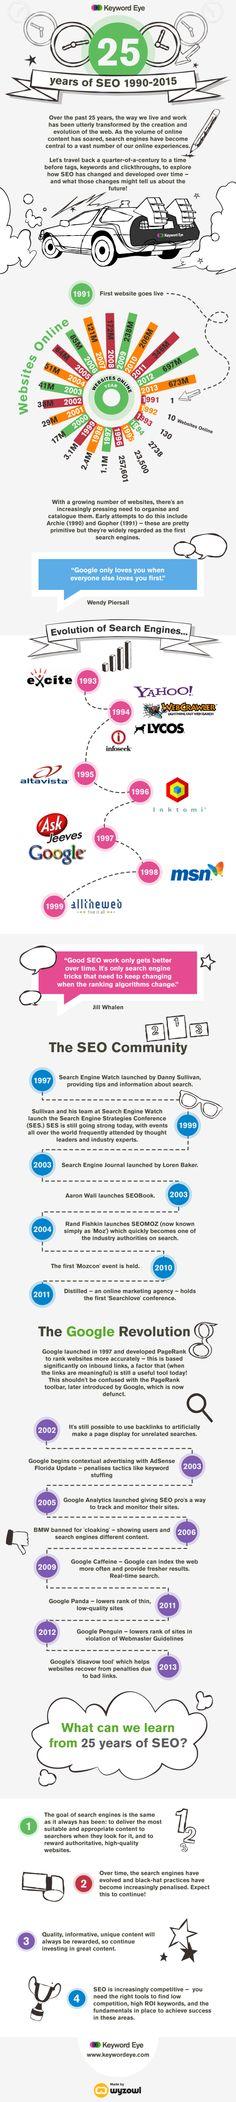 The History of Search Engine Optimization | Marketing Technology